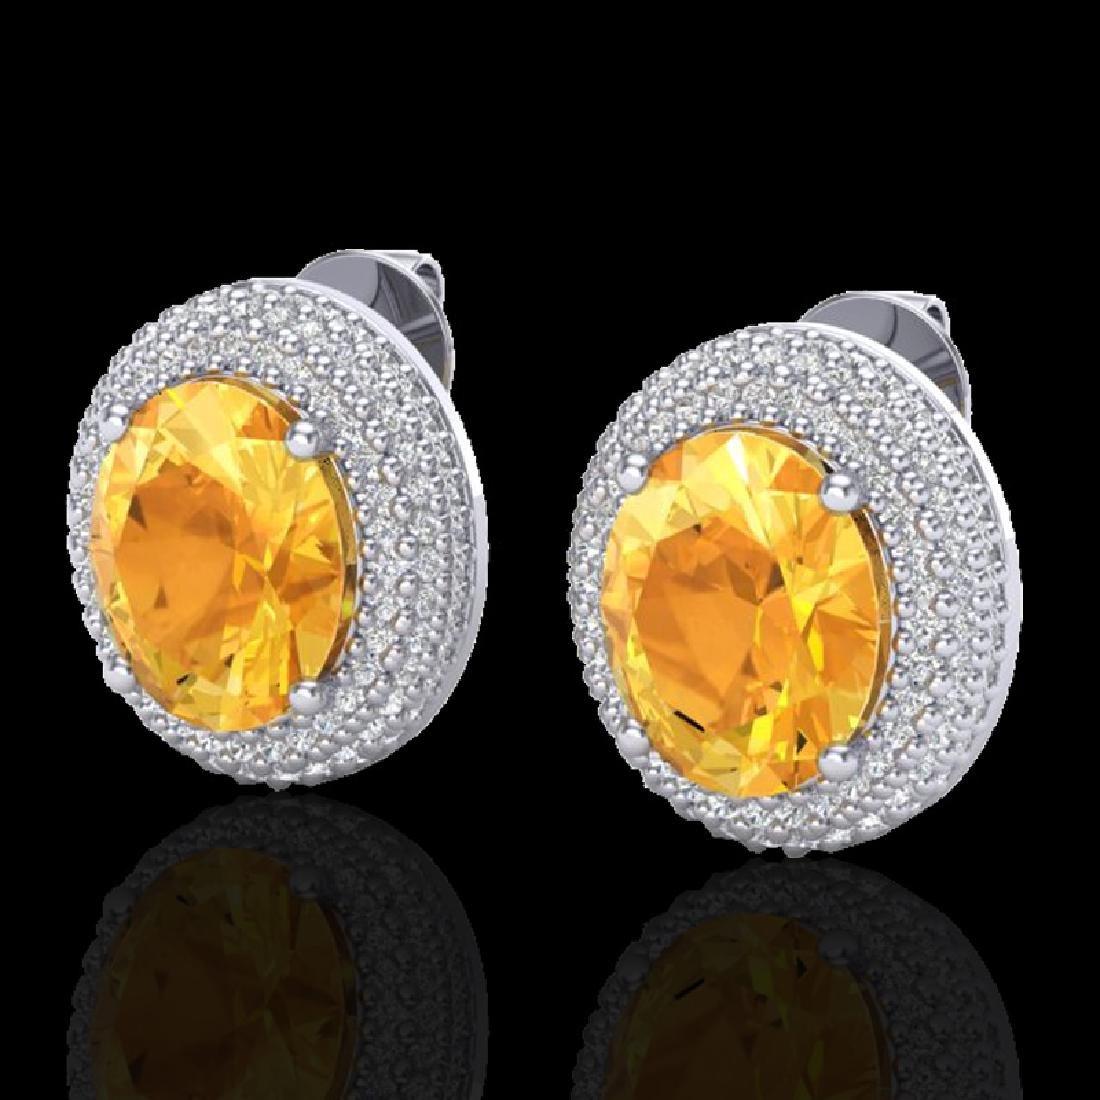 8 CTW Citrine & Micro Pave VS/SI Diamond Earrings 18K